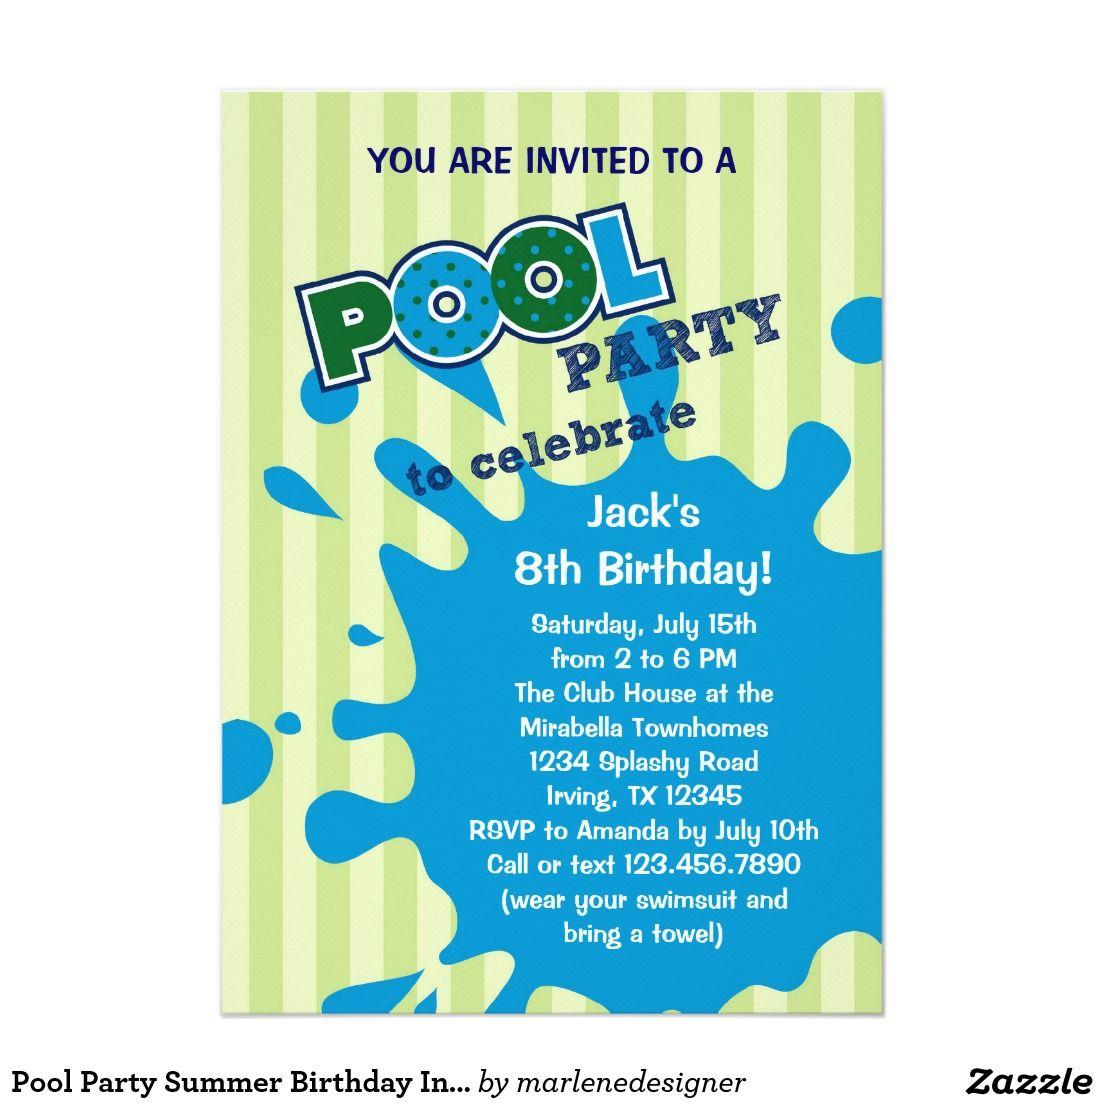 Pool Party Summer Birthday Invitation Zazzle Com Party Invite Template Pool Party Invitation Template Pool Party Invitations